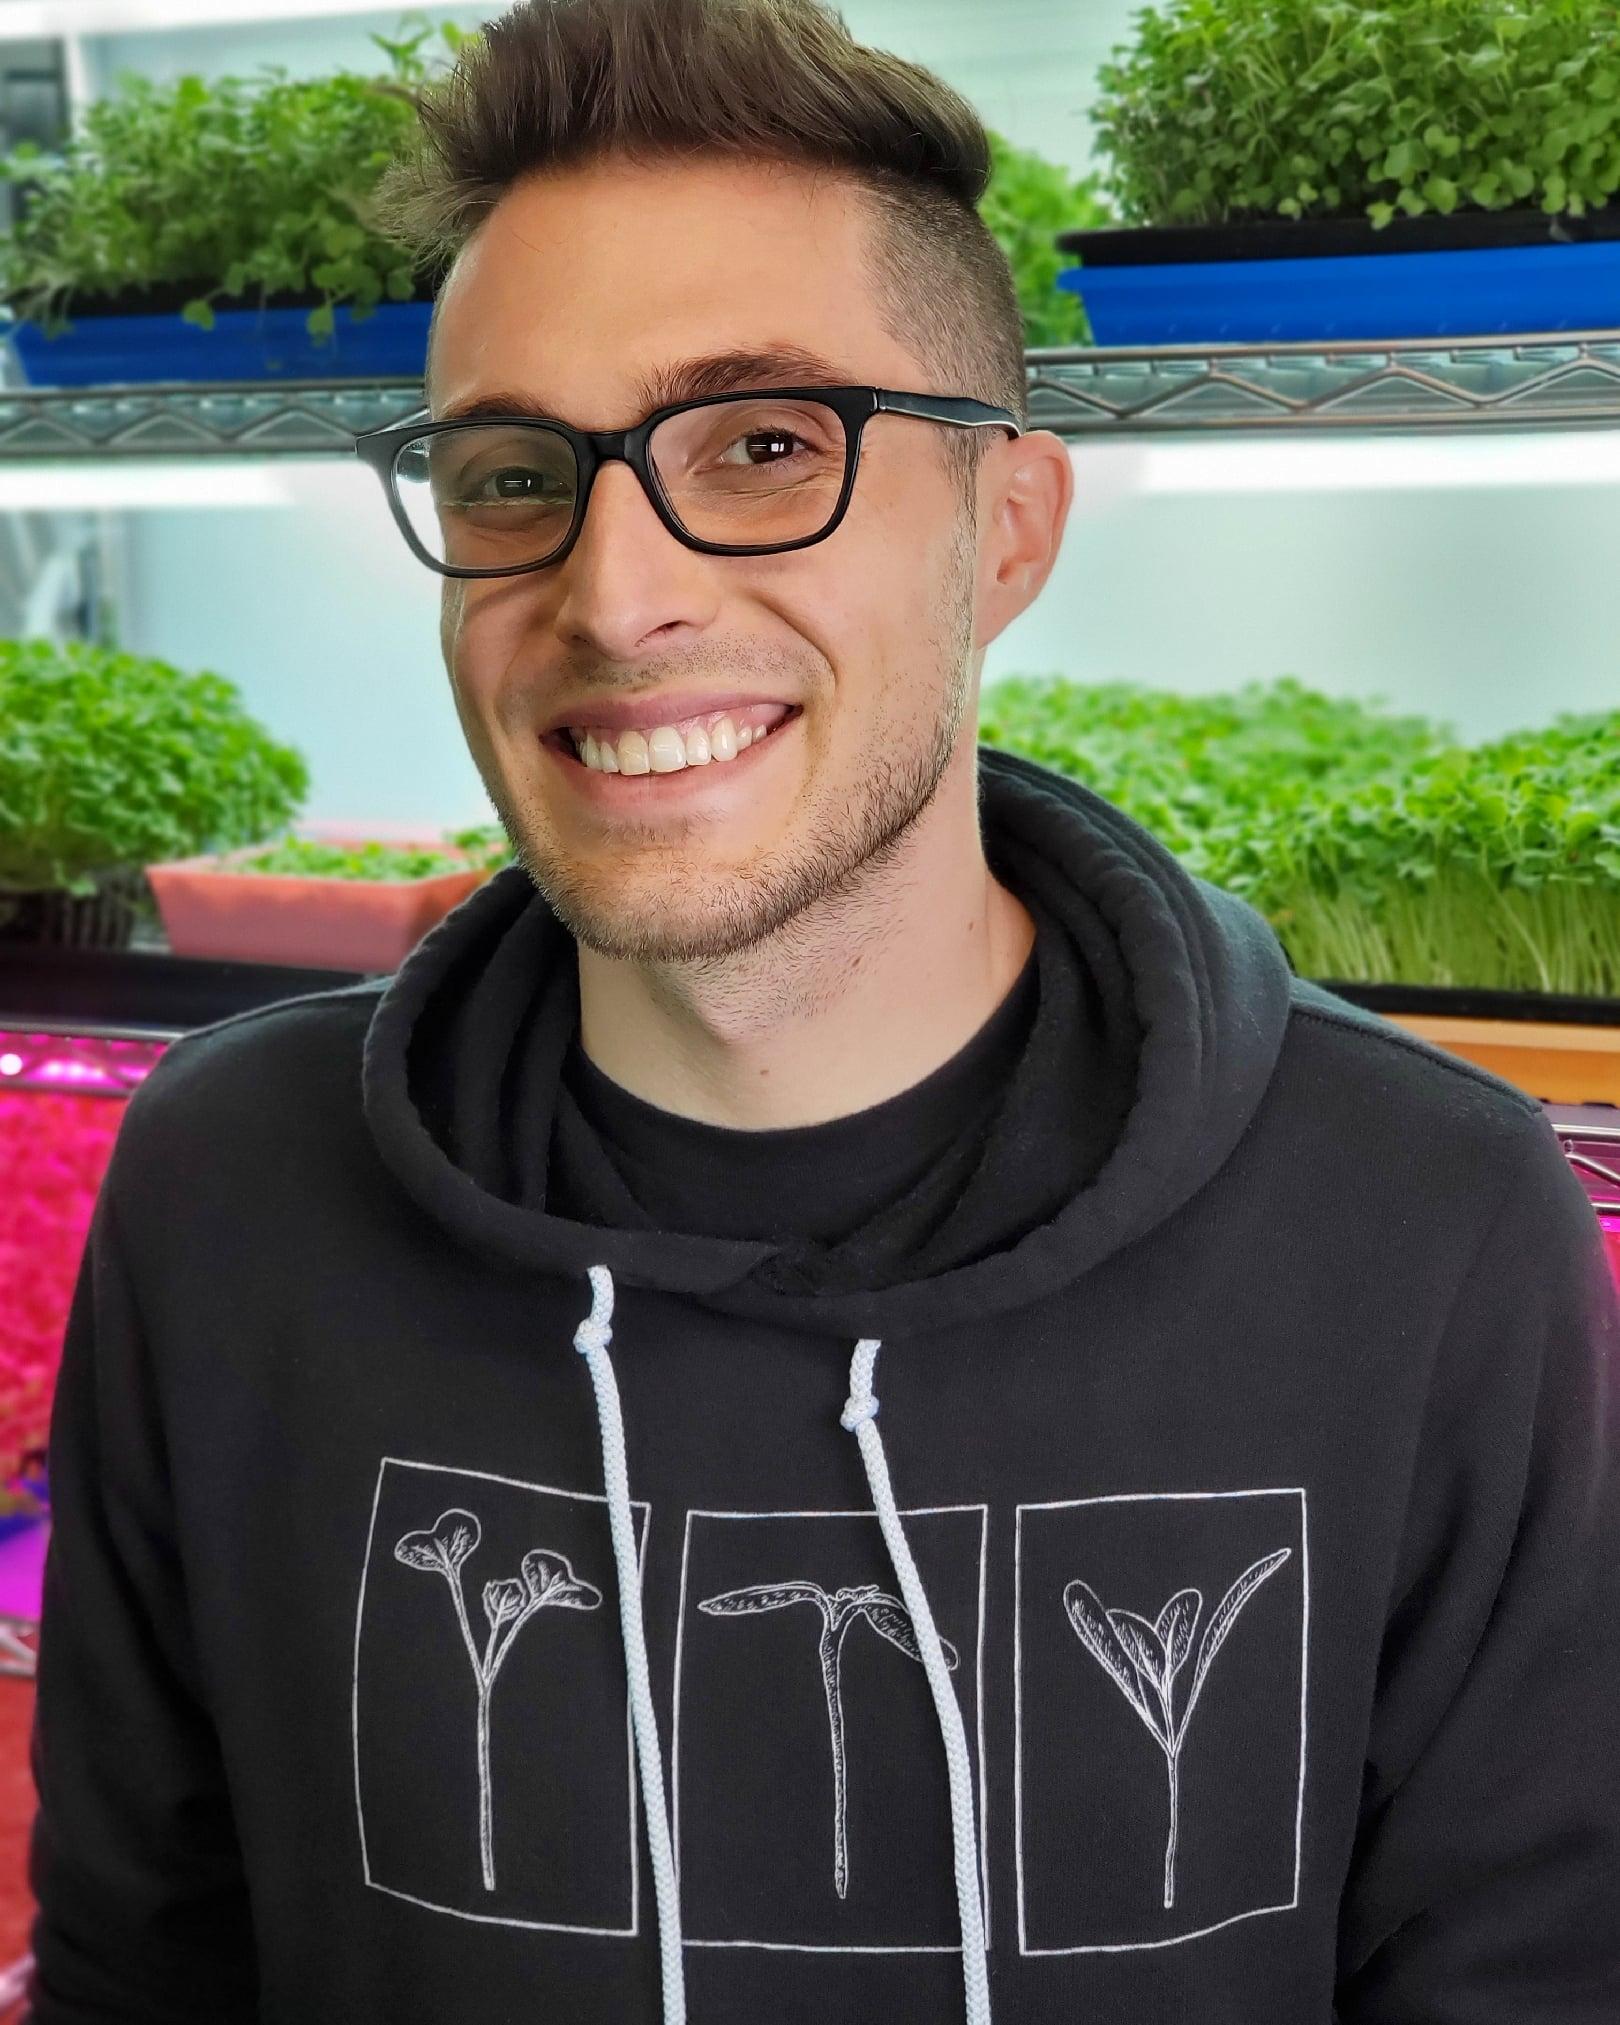 CJ Vaughn Owner of On The Grow, LLC wearing our Three Microgreens Shirt Design